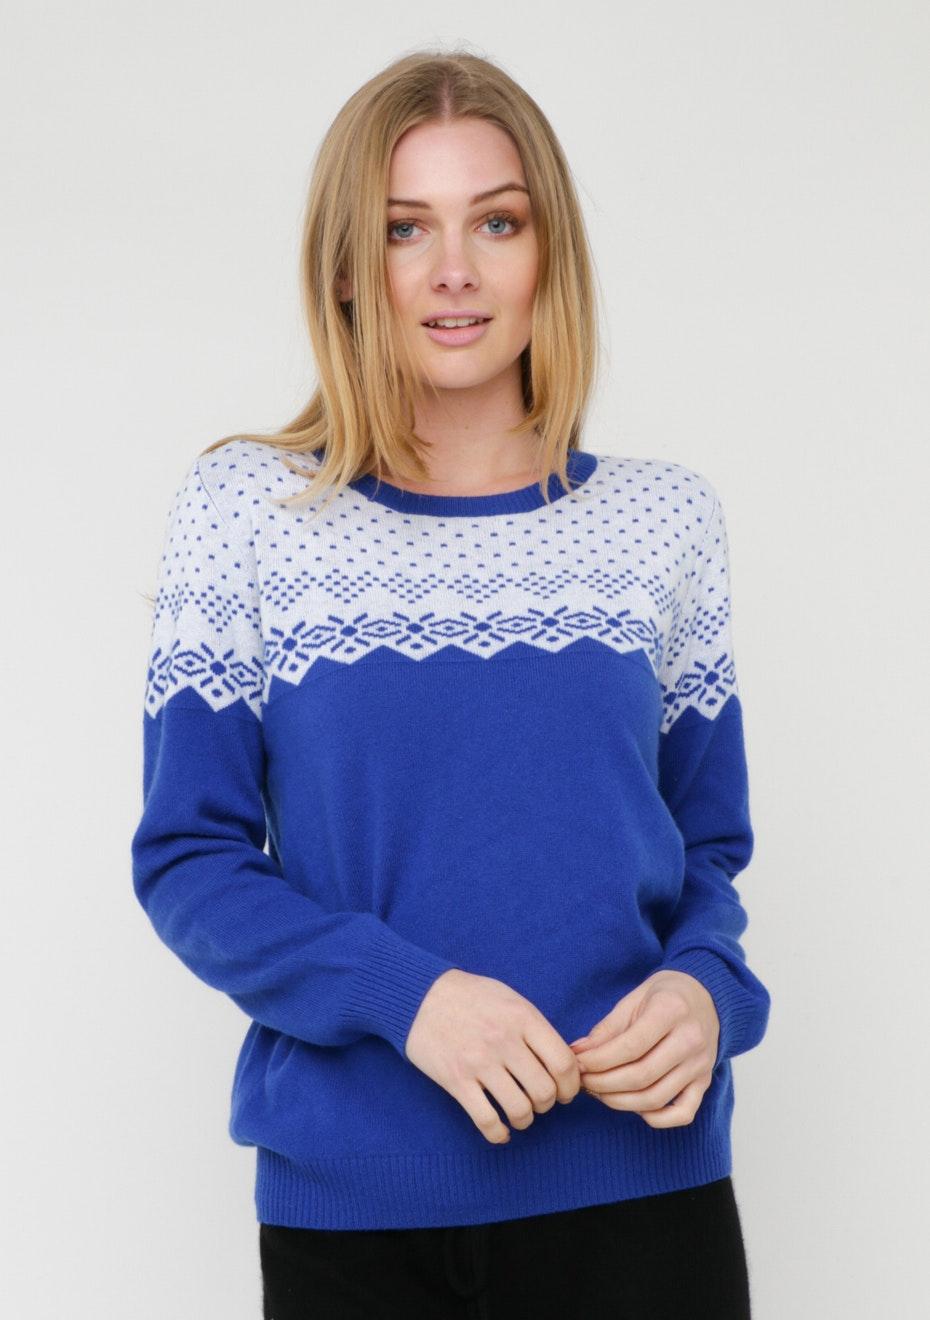 Printed Pure Cashmere Top - BLUE / WHITE PRINT